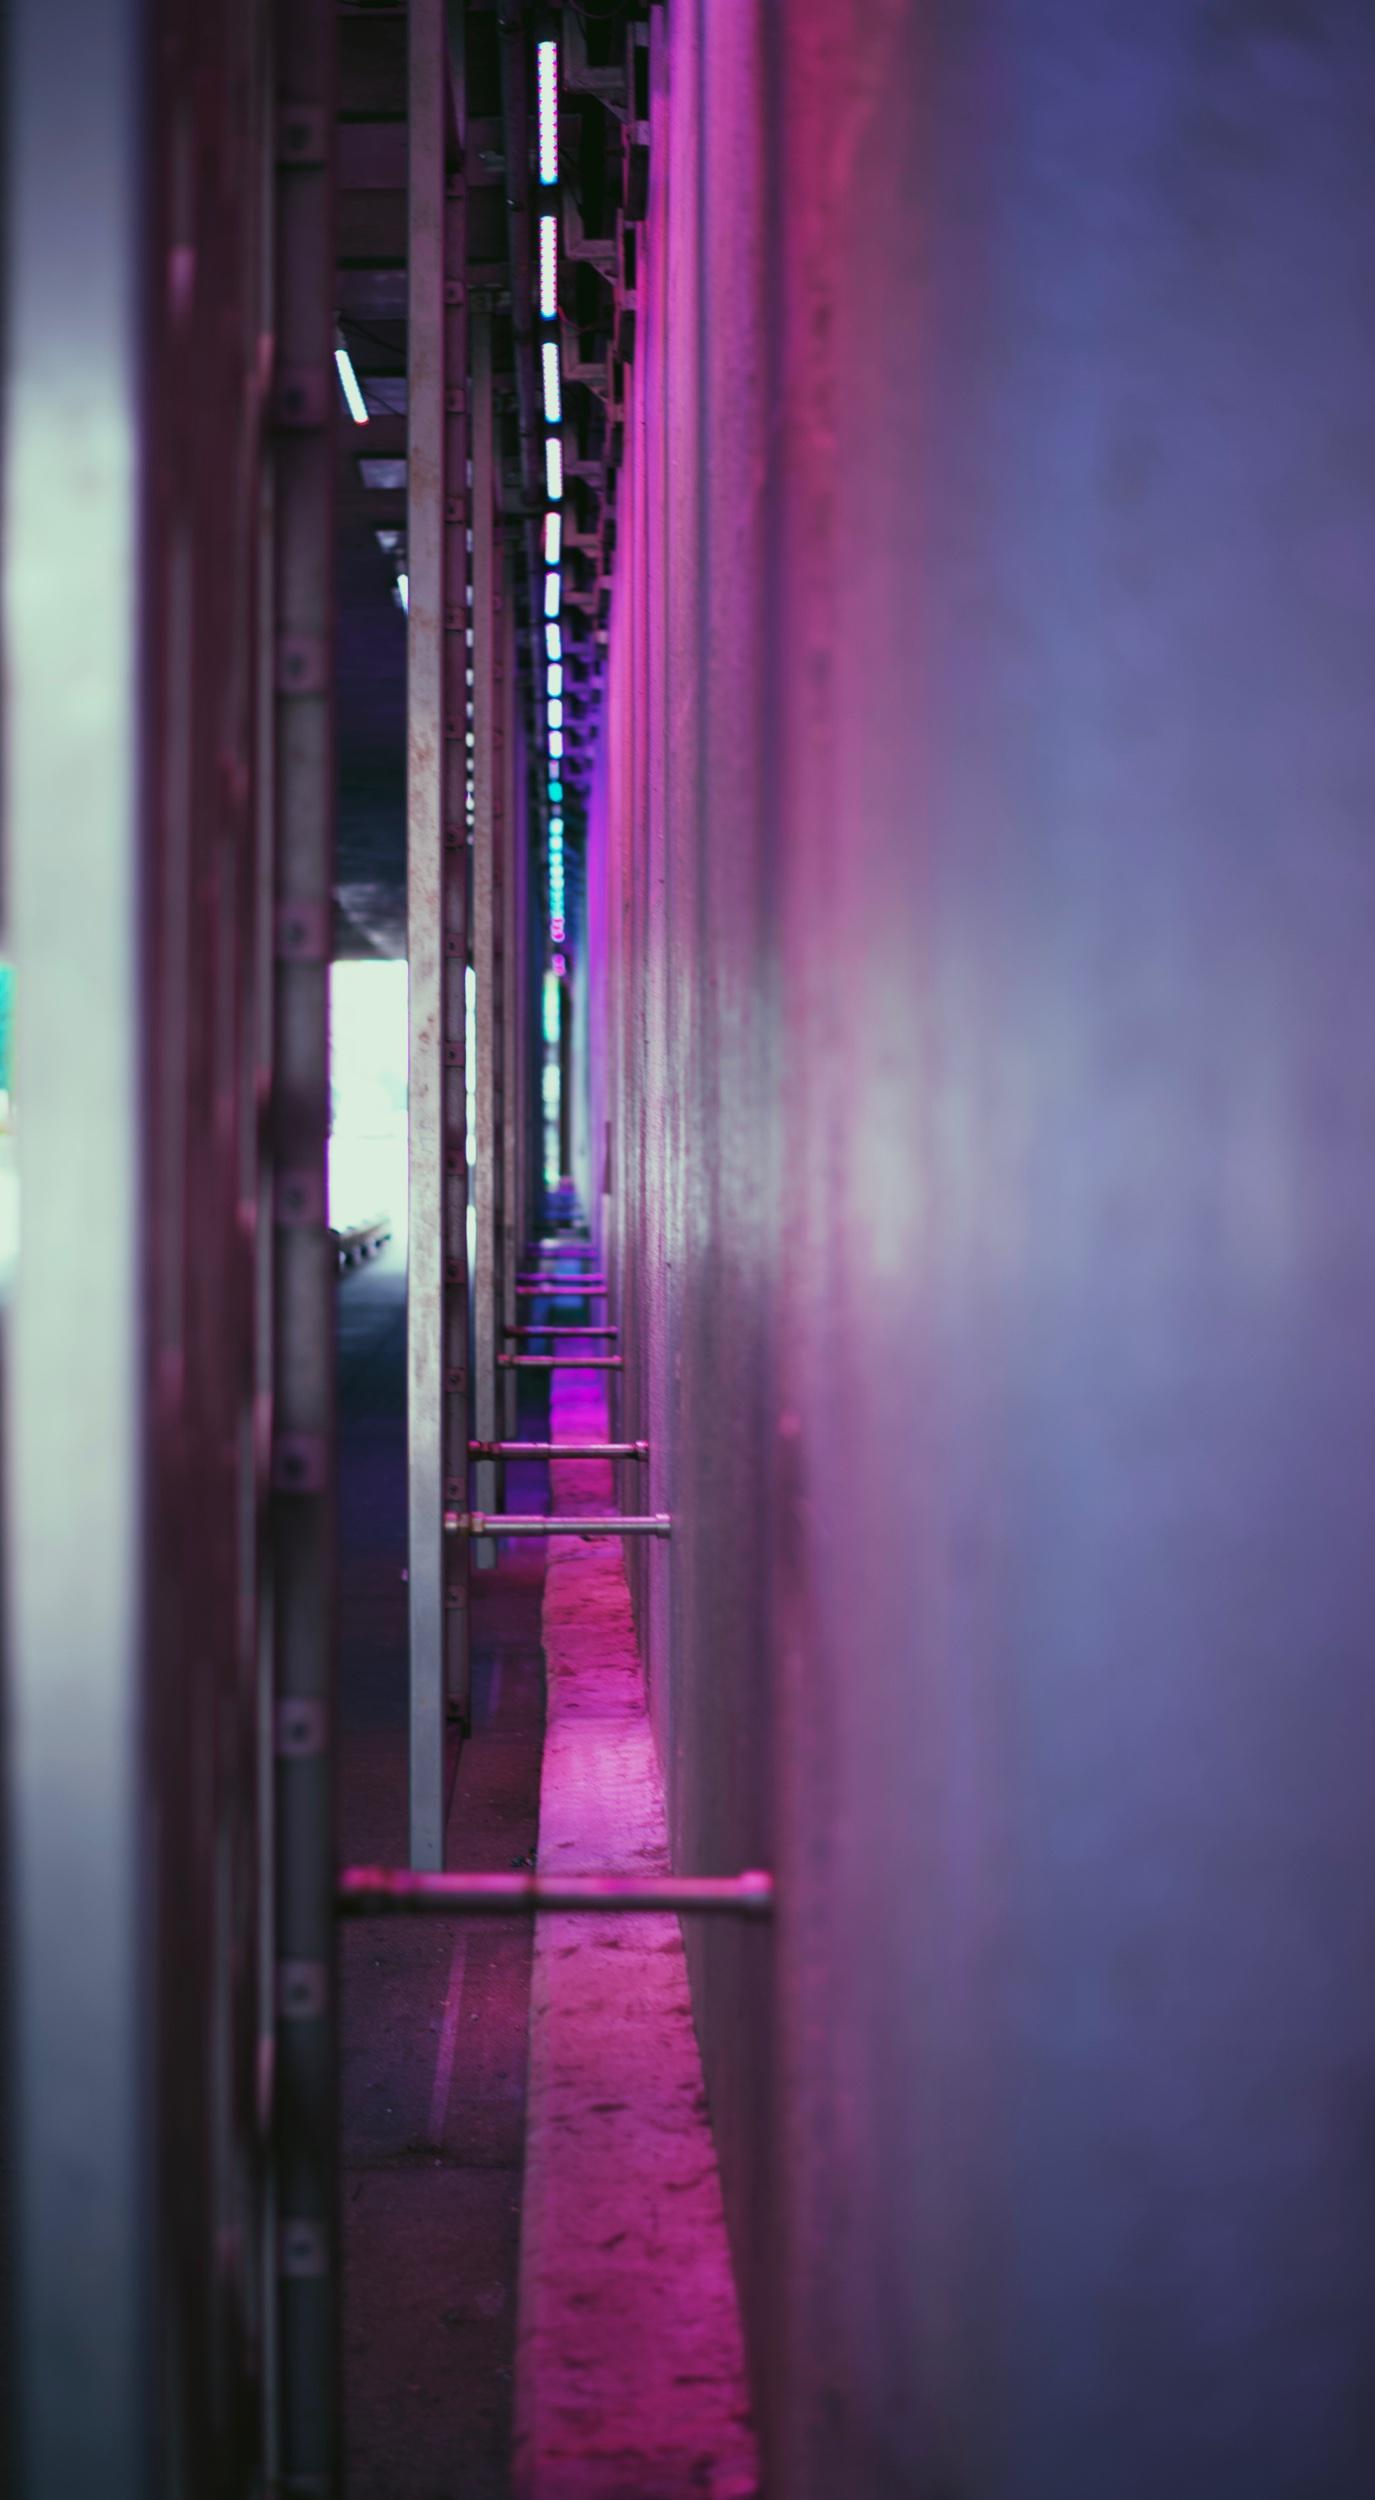 Neo Neon. Chicago, Illinois. May 2019.